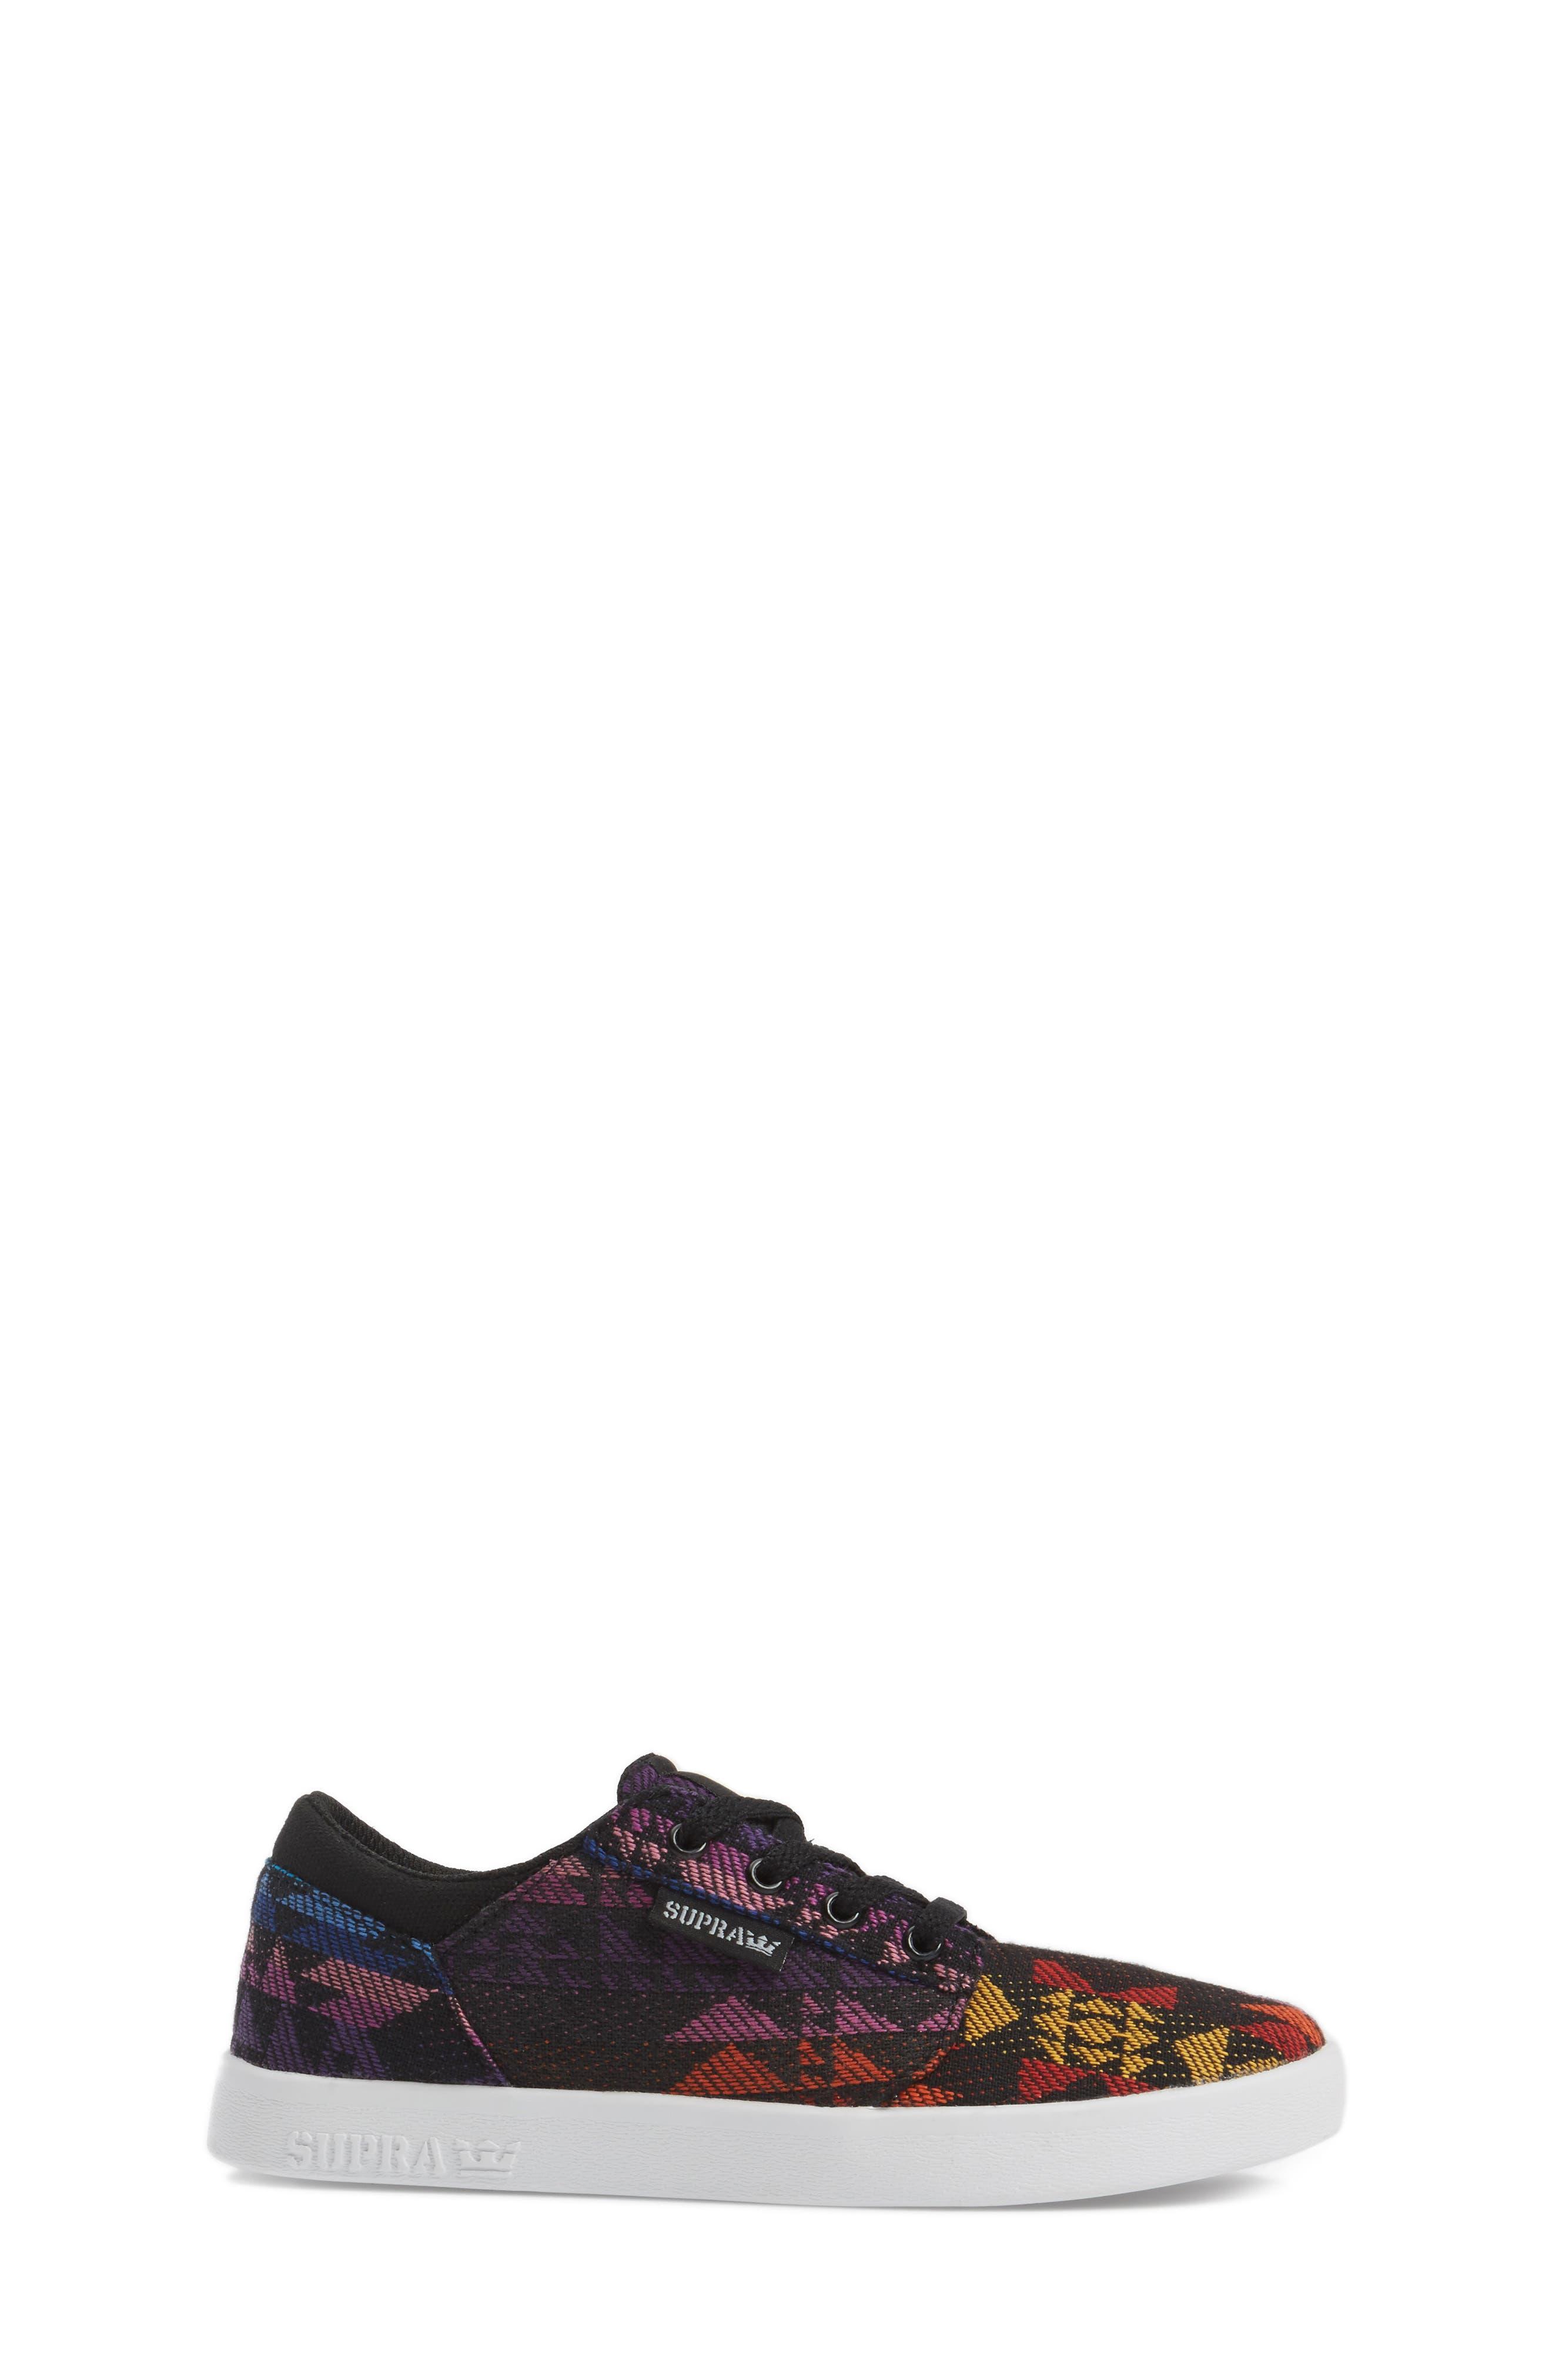 Alternate Image 3  - Supra Yorek Low Top Sneaker (Toddler, Little Kid & Big Kid)